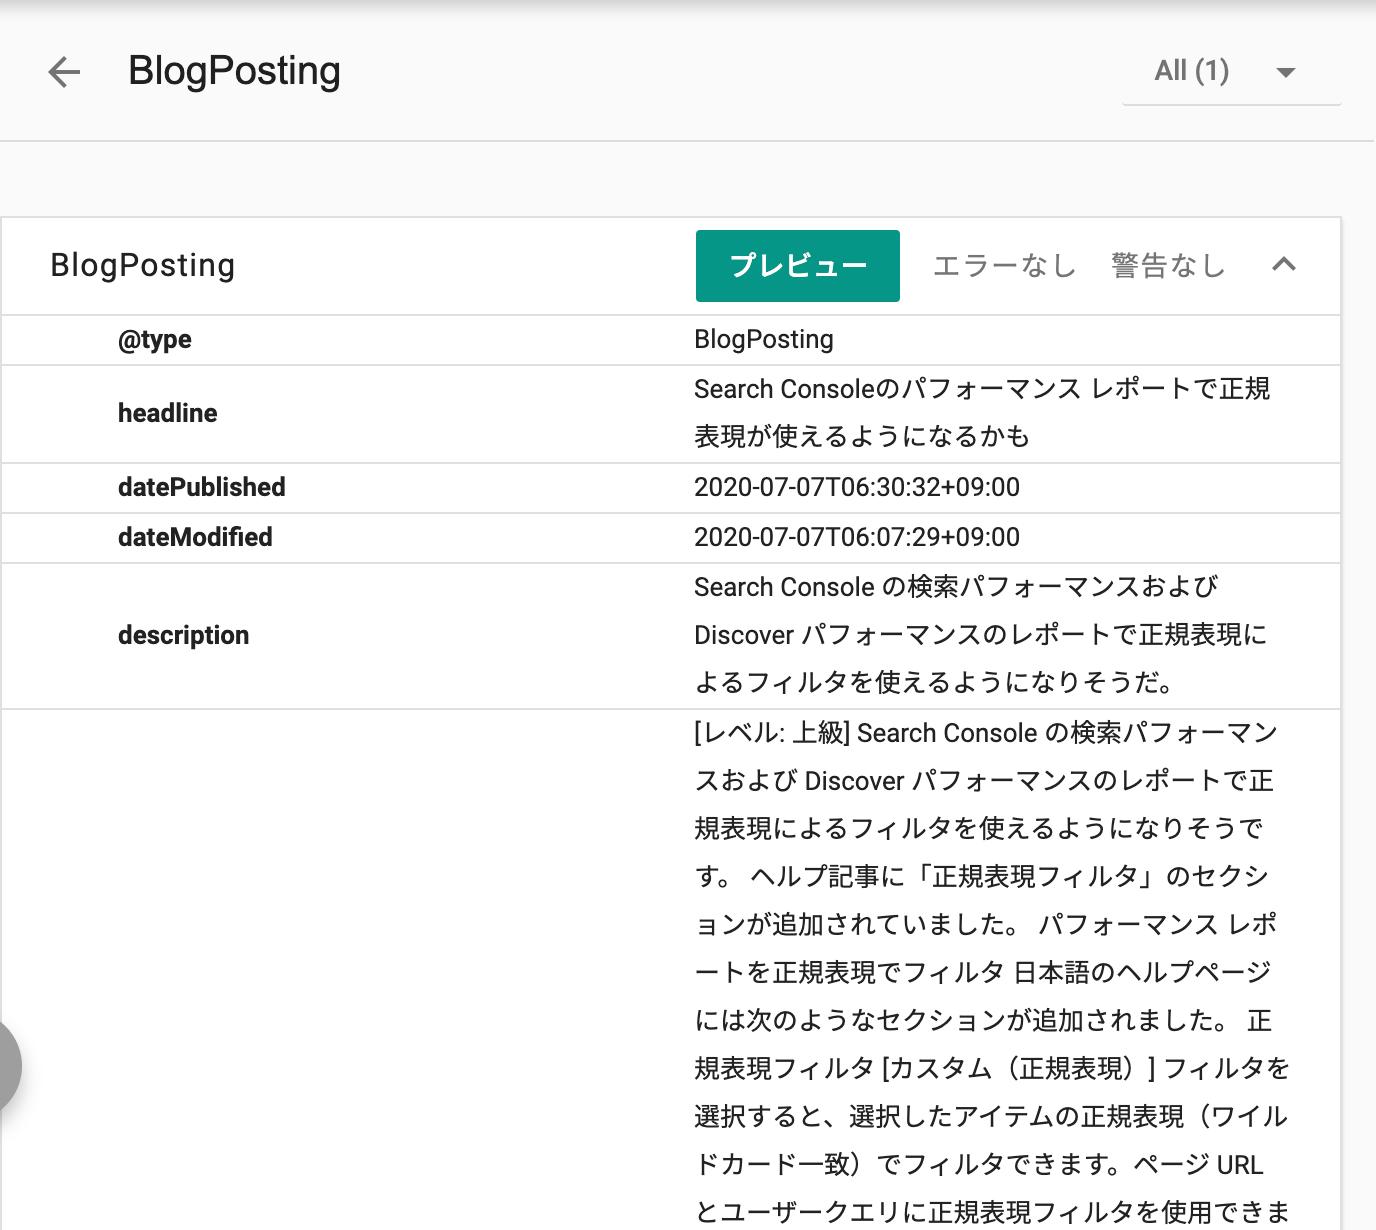 BlogPosting 構造化データ